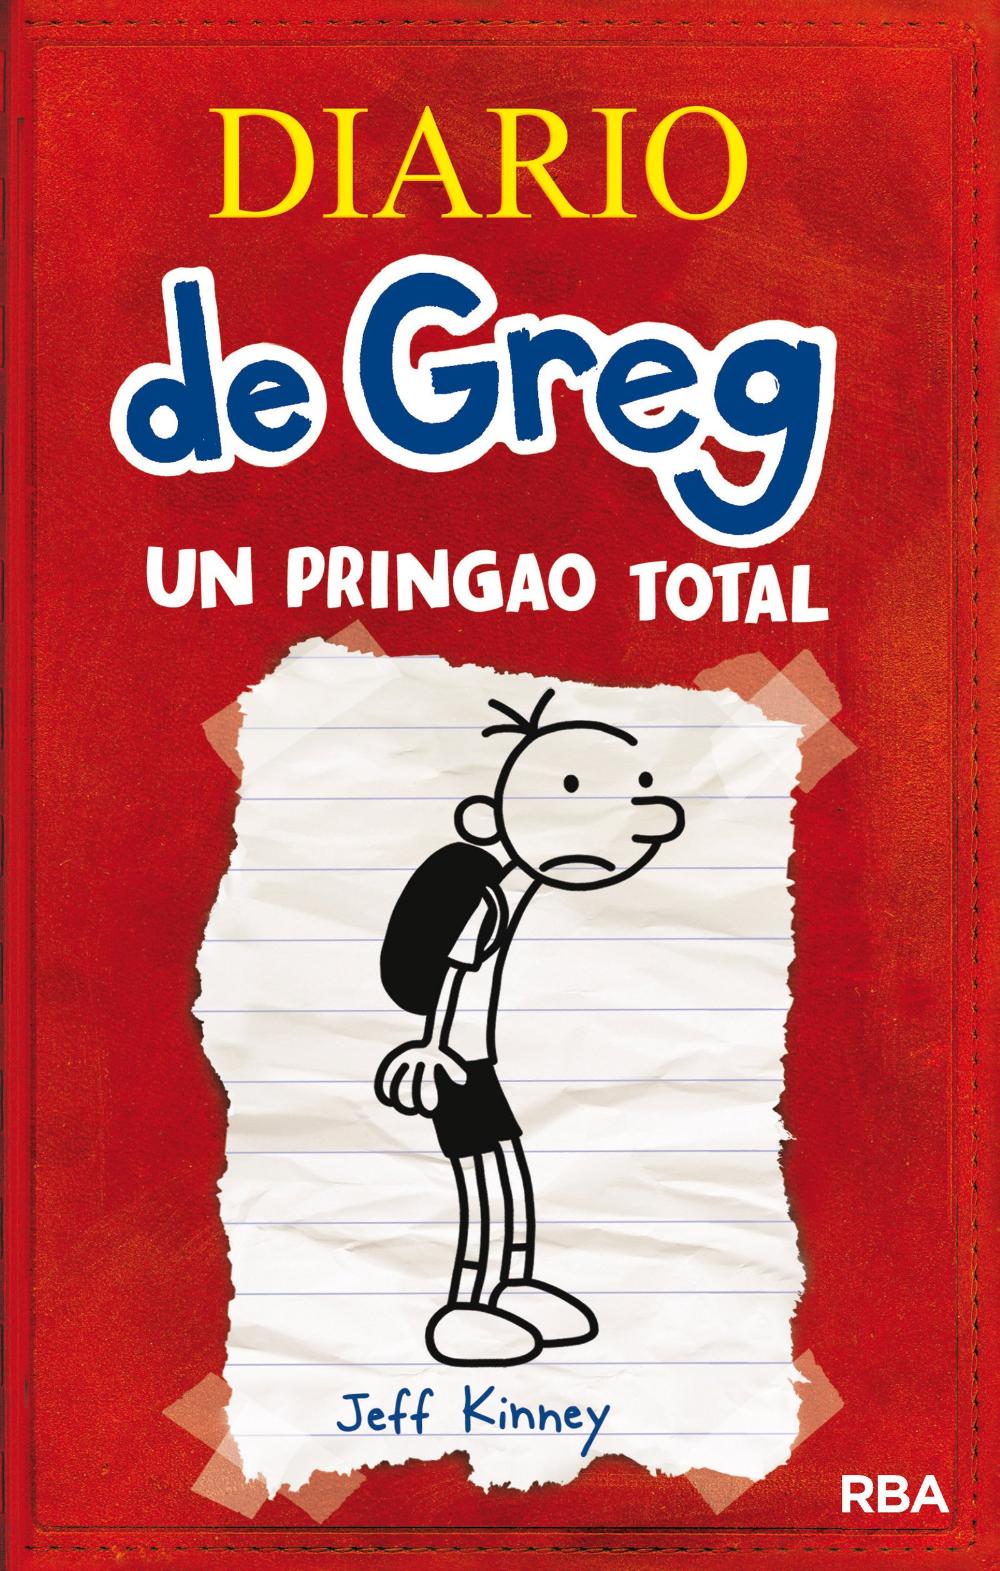 Foto Portada El Diario De Greg 1 Búsqueda De Google Jeff Kinney Wimpy Kid Books Wimpy Kid